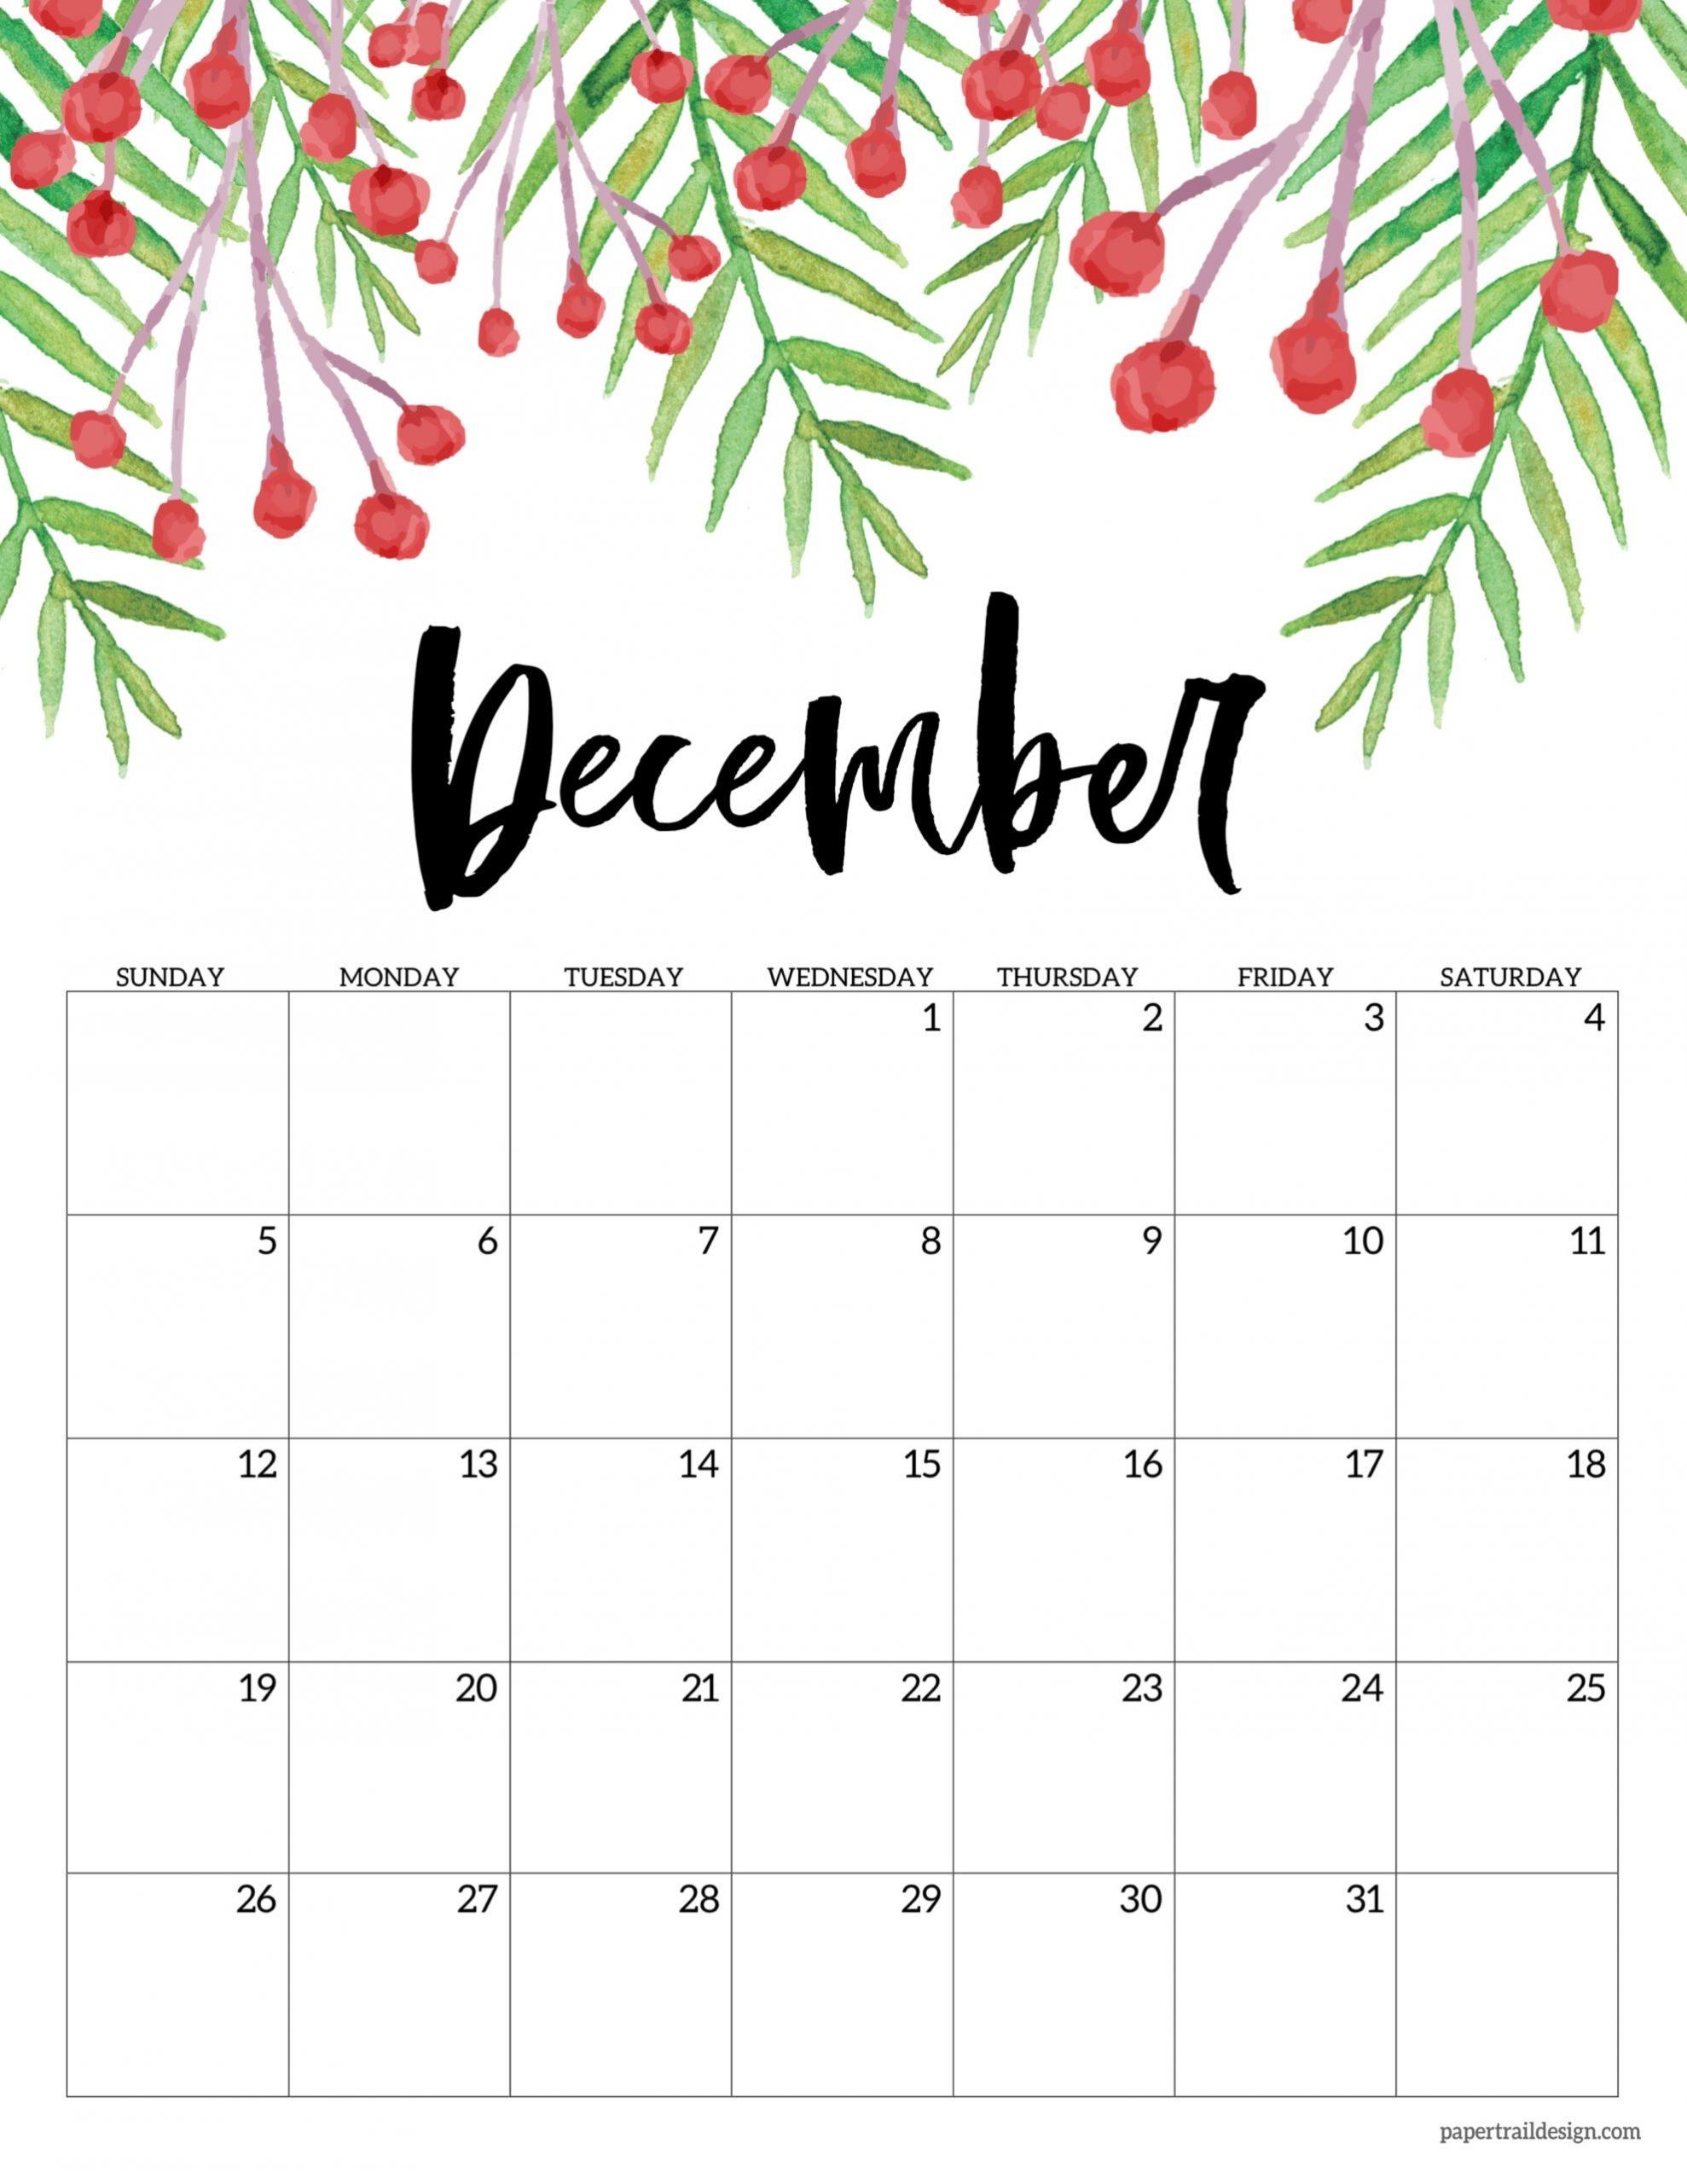 Catch December Calender Images 2021